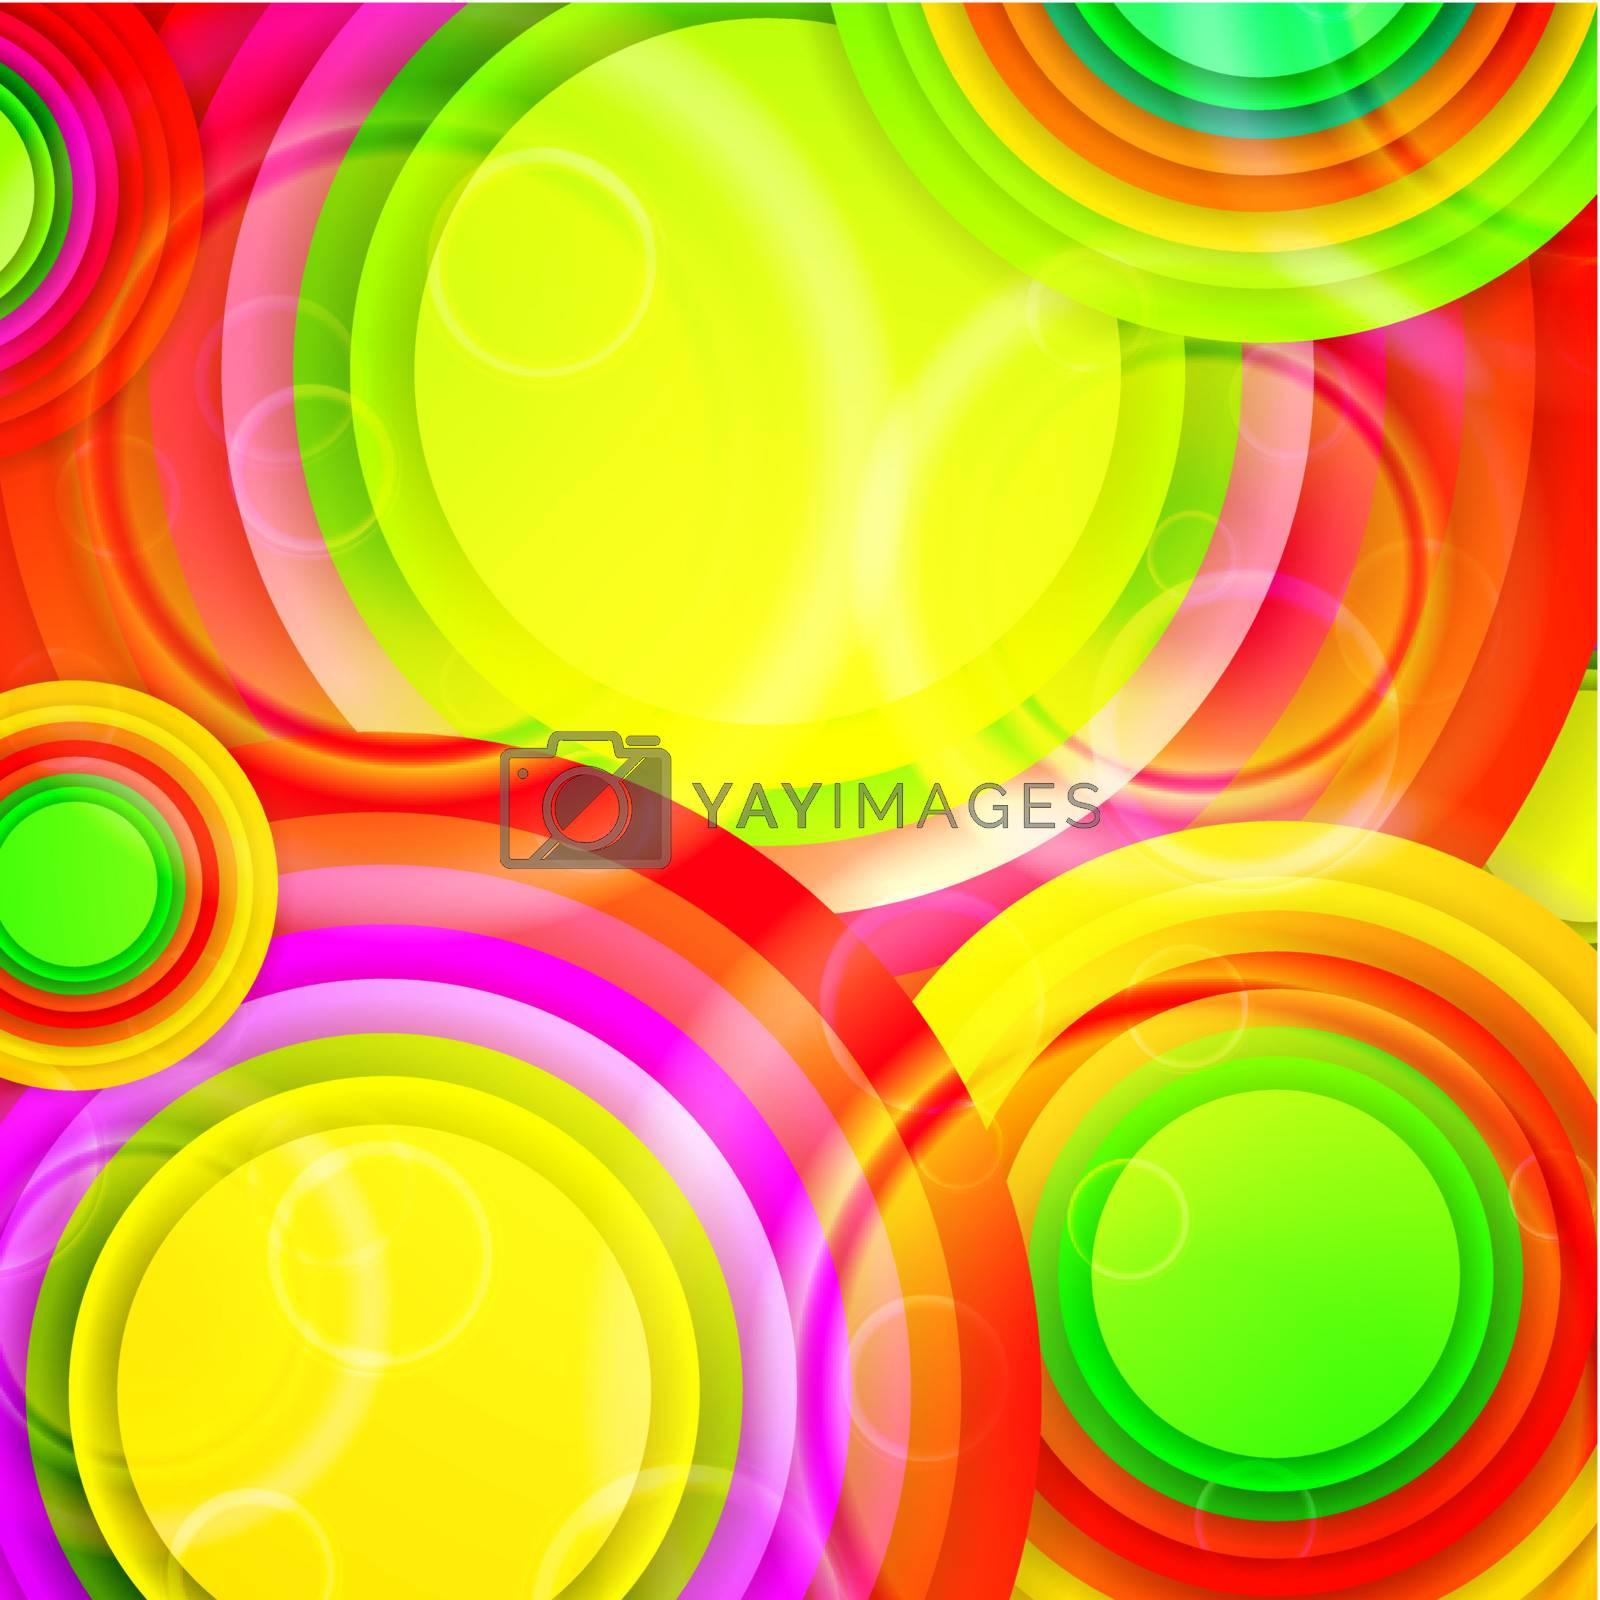 Royalty free image of multicolored background by razvodovska